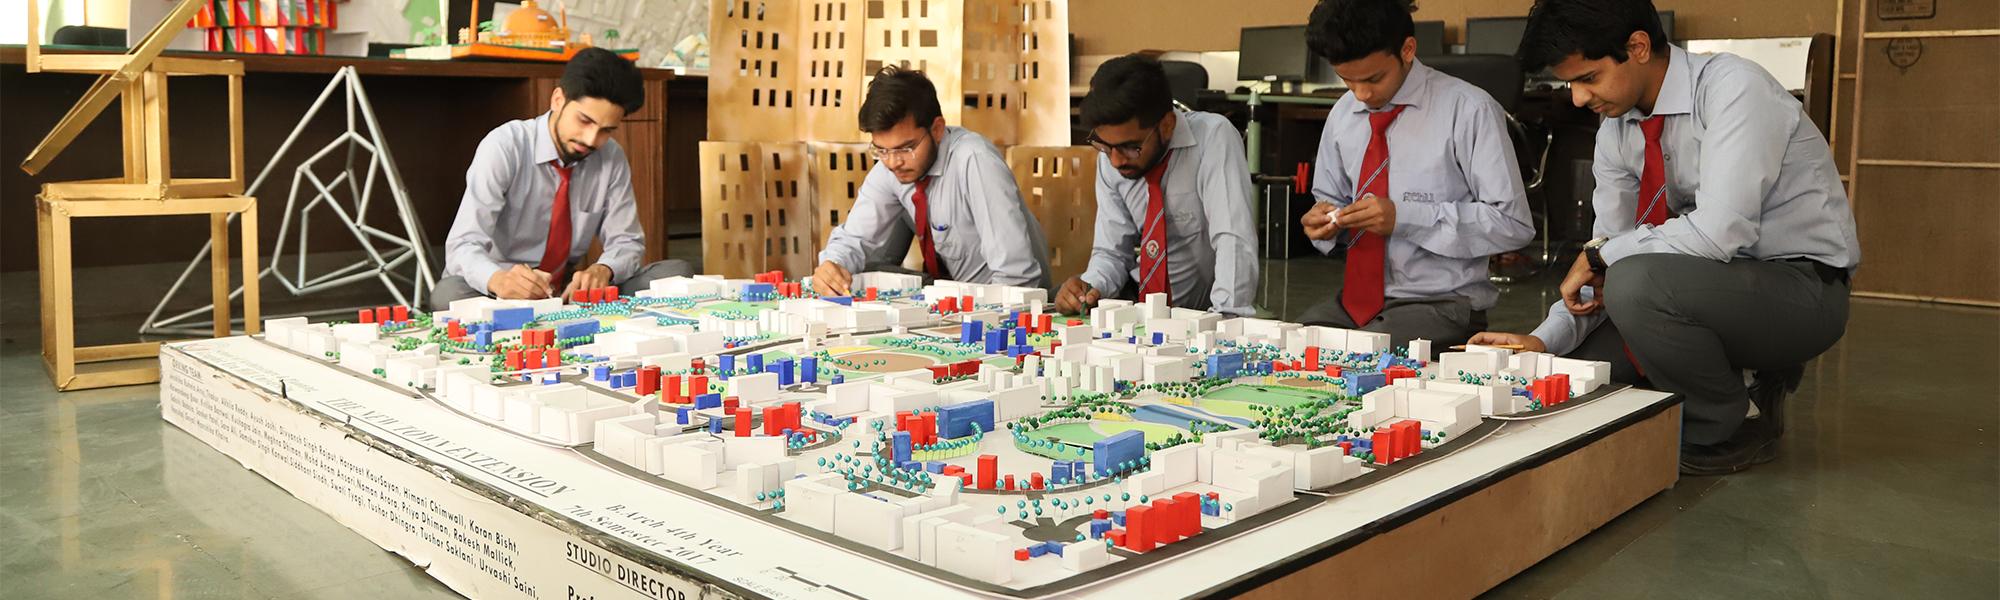 Architecture and Planning GEHU (Graphic Hill univesity) Dehradun